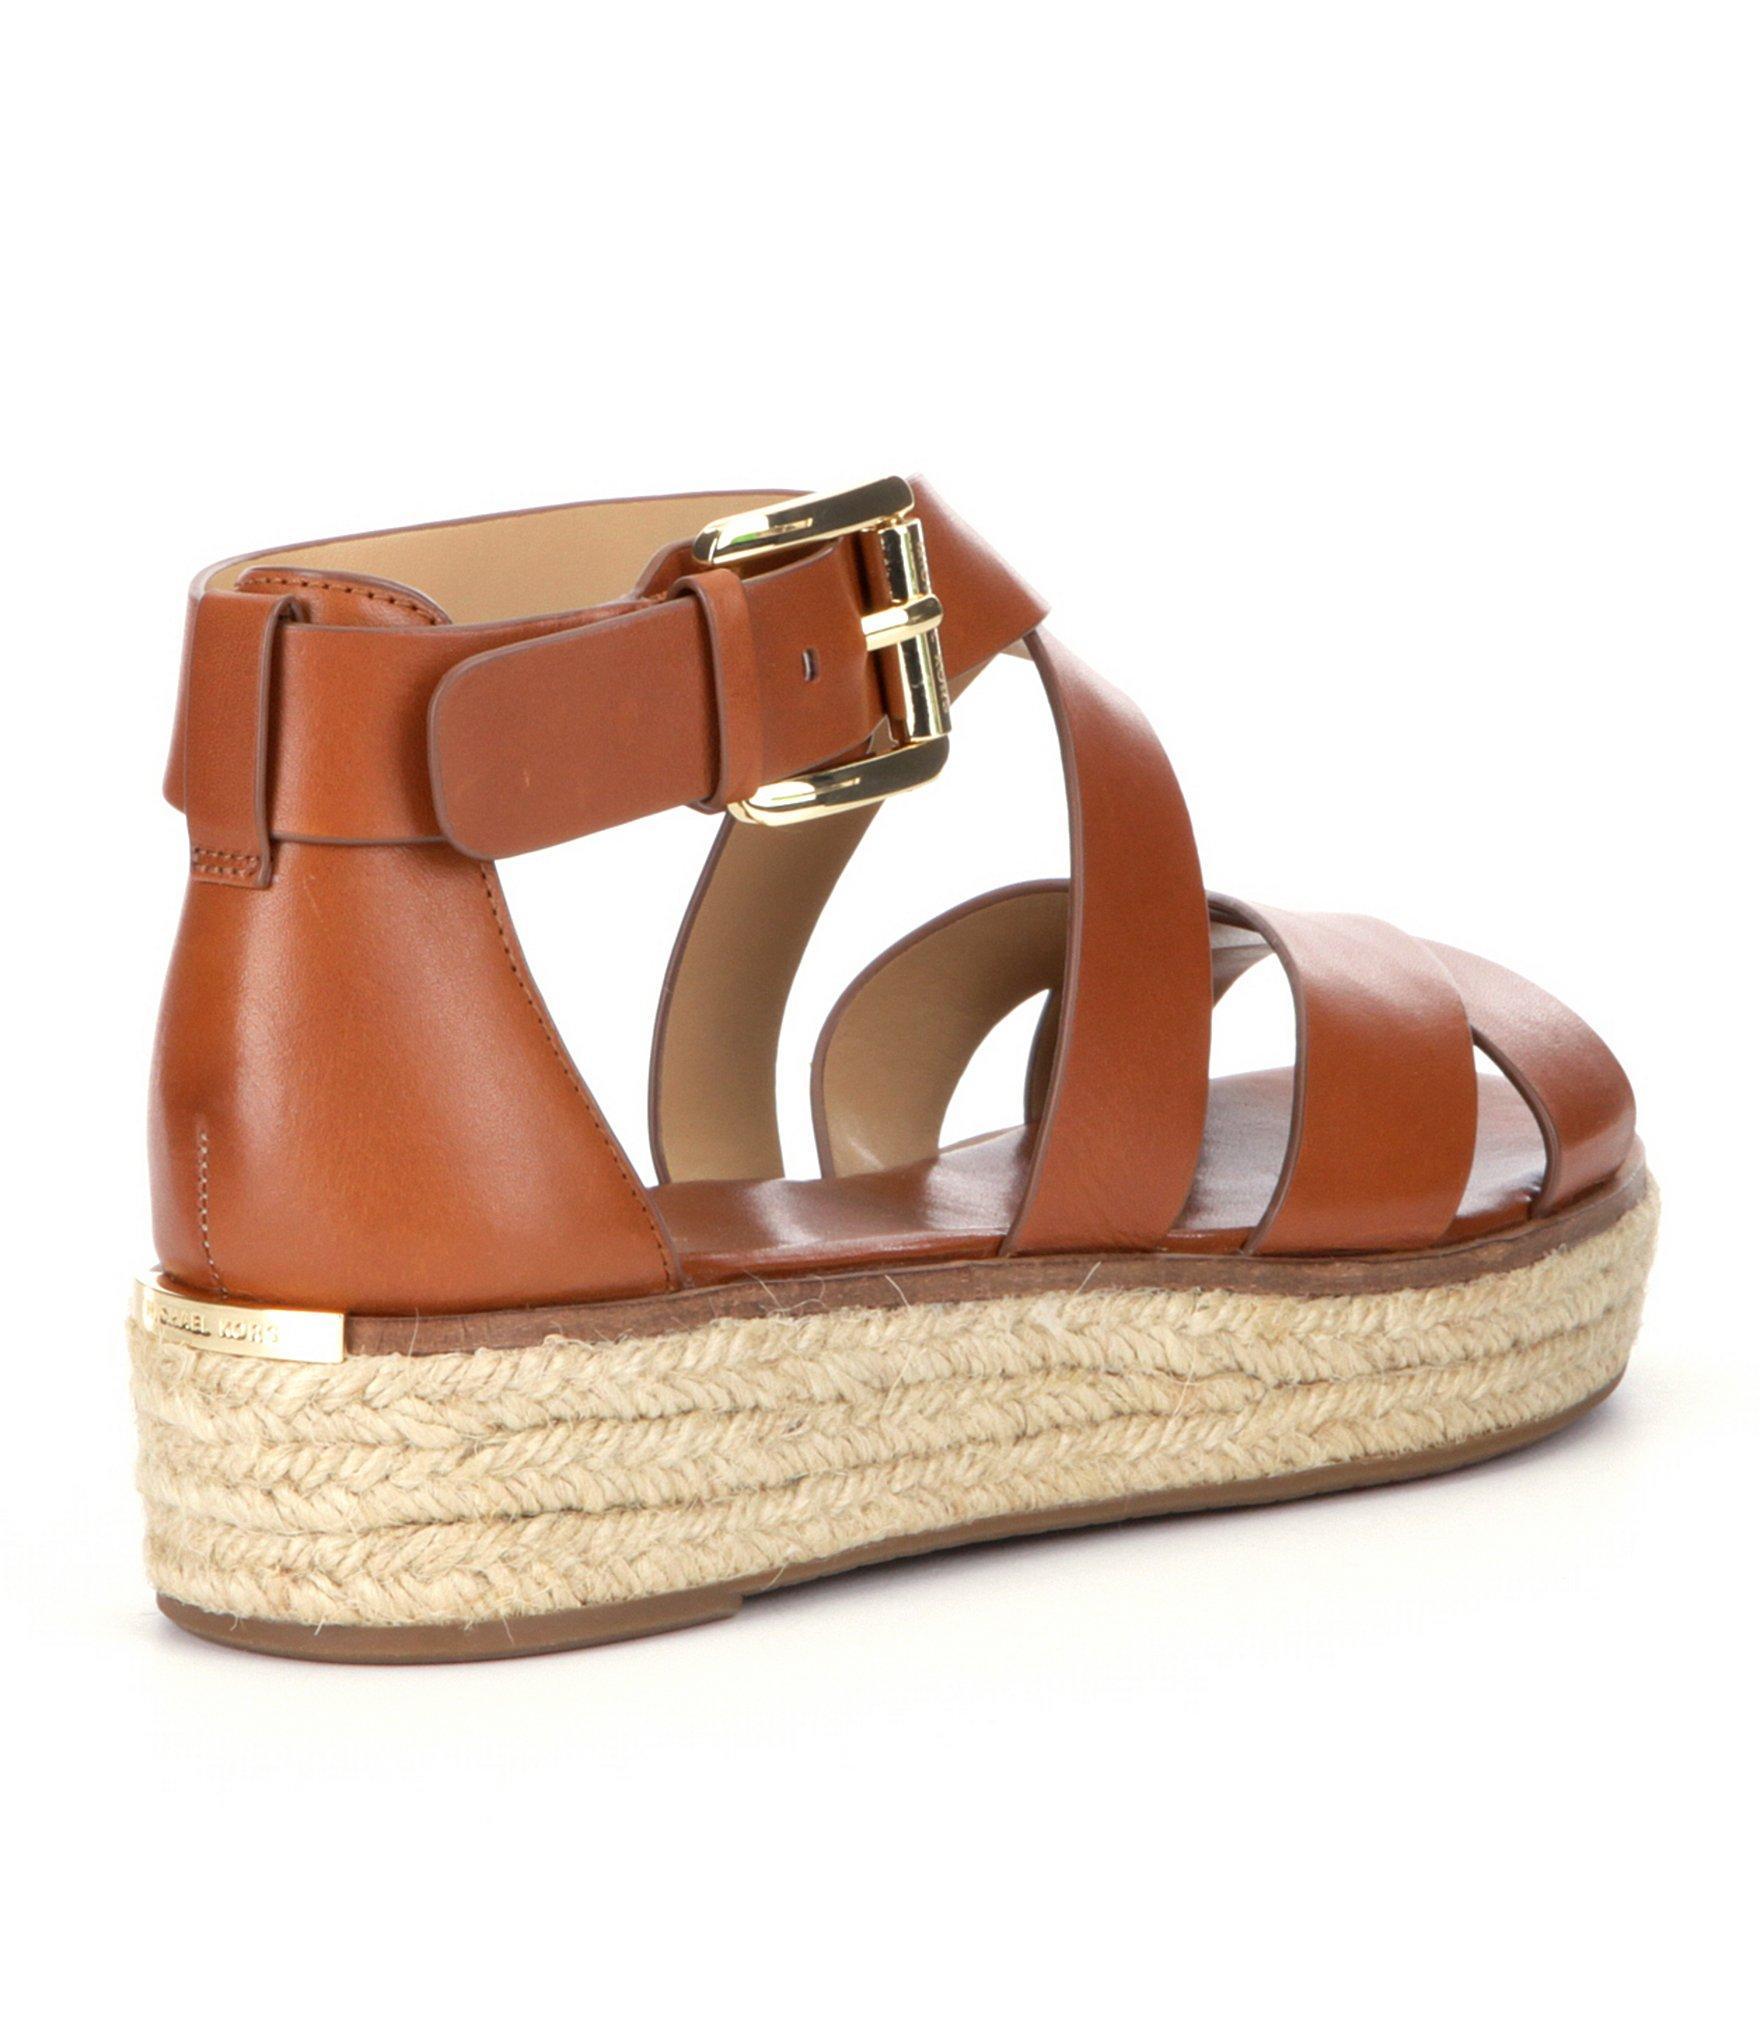 Michael Kors - Portia Flex mirror leather sandals